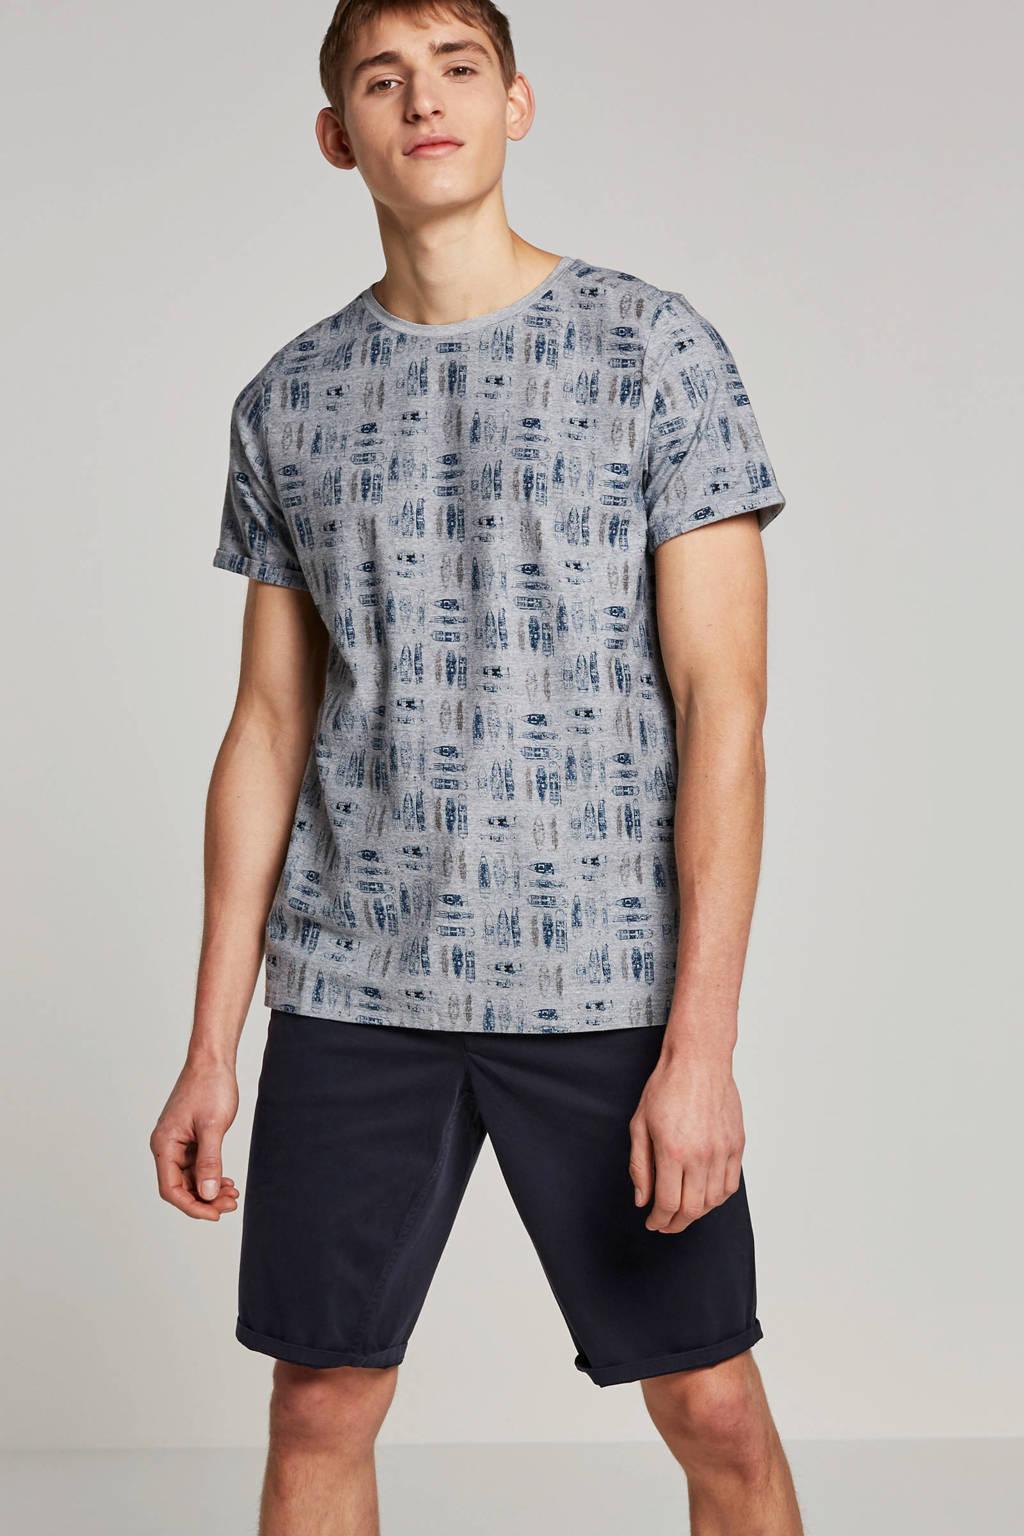 Twinlife T-shirt, Grijs melange